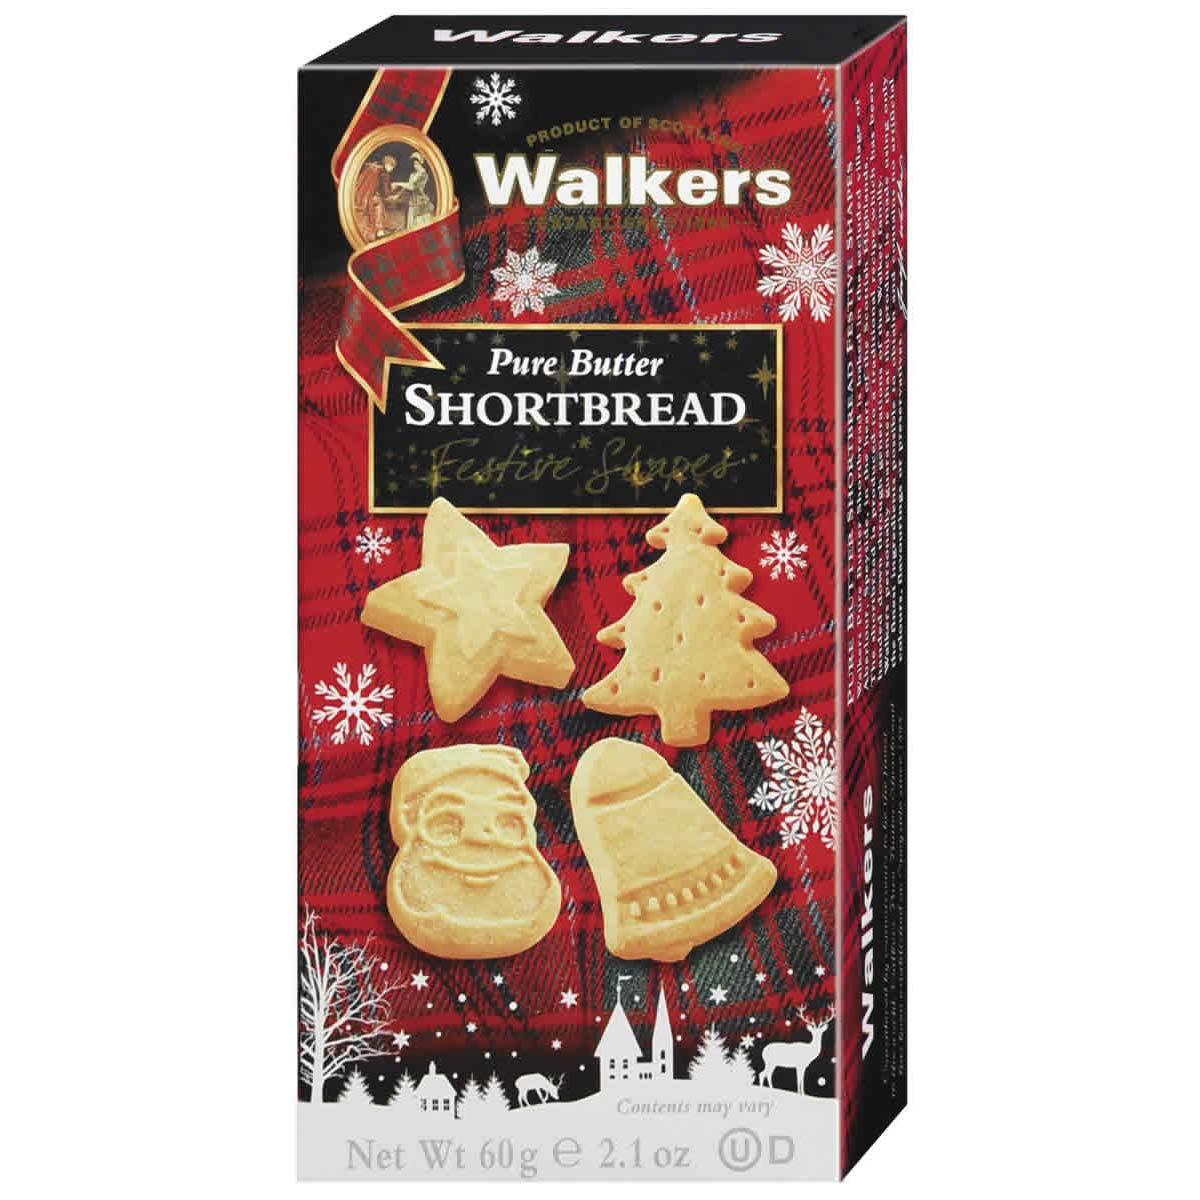 Walkers Shortbread – Festive Shapes Shortbread 60g.